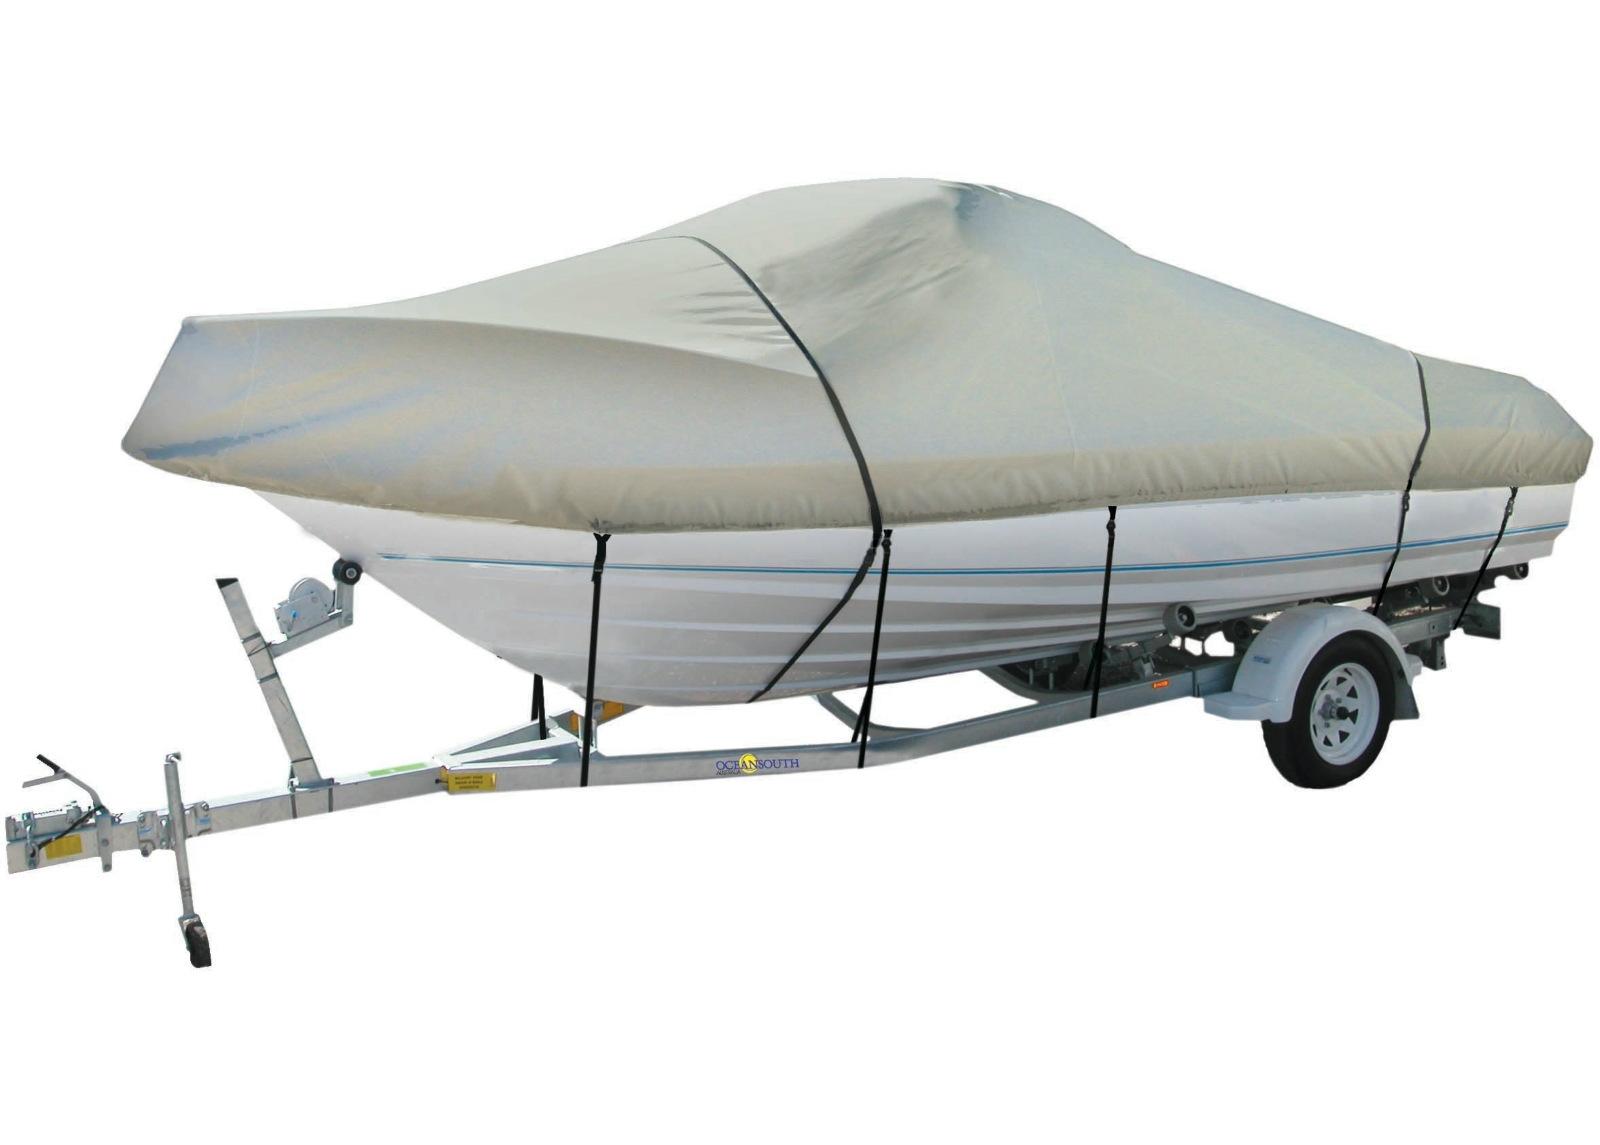 Venepeite Cabin Cruiser tyyppisille veneille 5.6-5.9 m